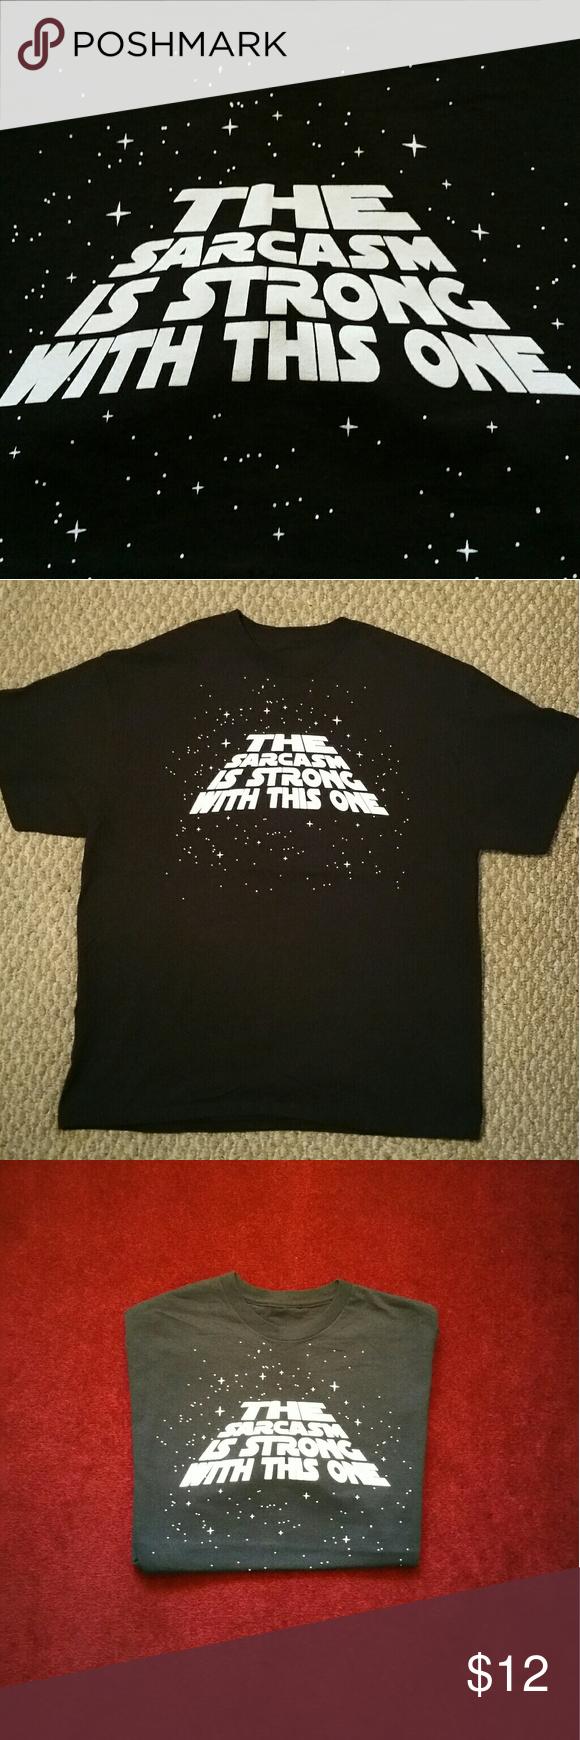 Women's Sarcasm Crew Neck T-Shirt No Known Brand, size 2XL, *bundle friendly* Tops Tees - Short Sleeve